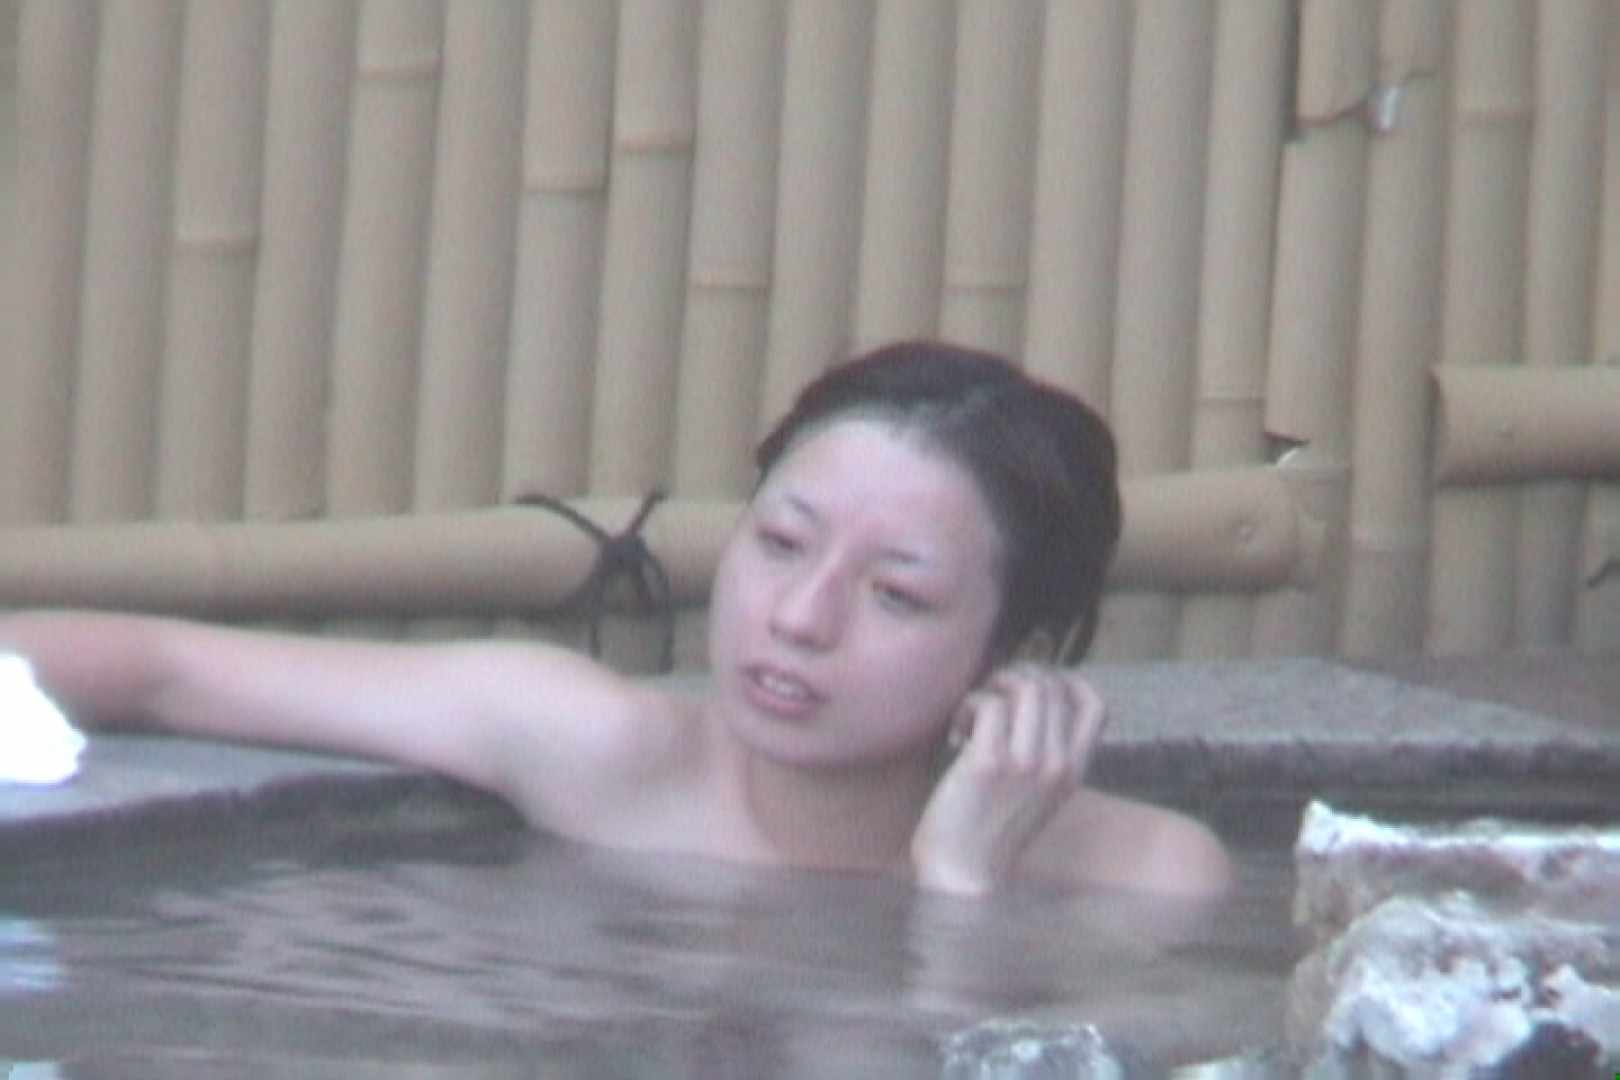 Aquaな露天風呂Vol.608 HなOL | 盗撮  89pic 64